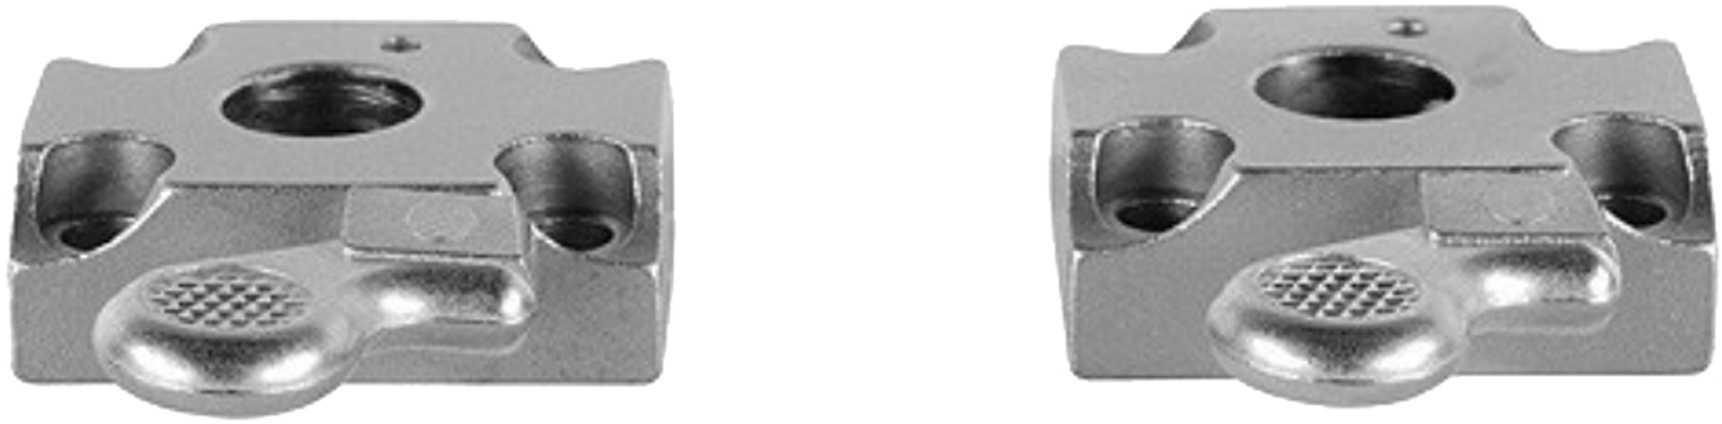 Leupold Qr Browning X-Bolt 2-Pc Mount Silver Md: 66085